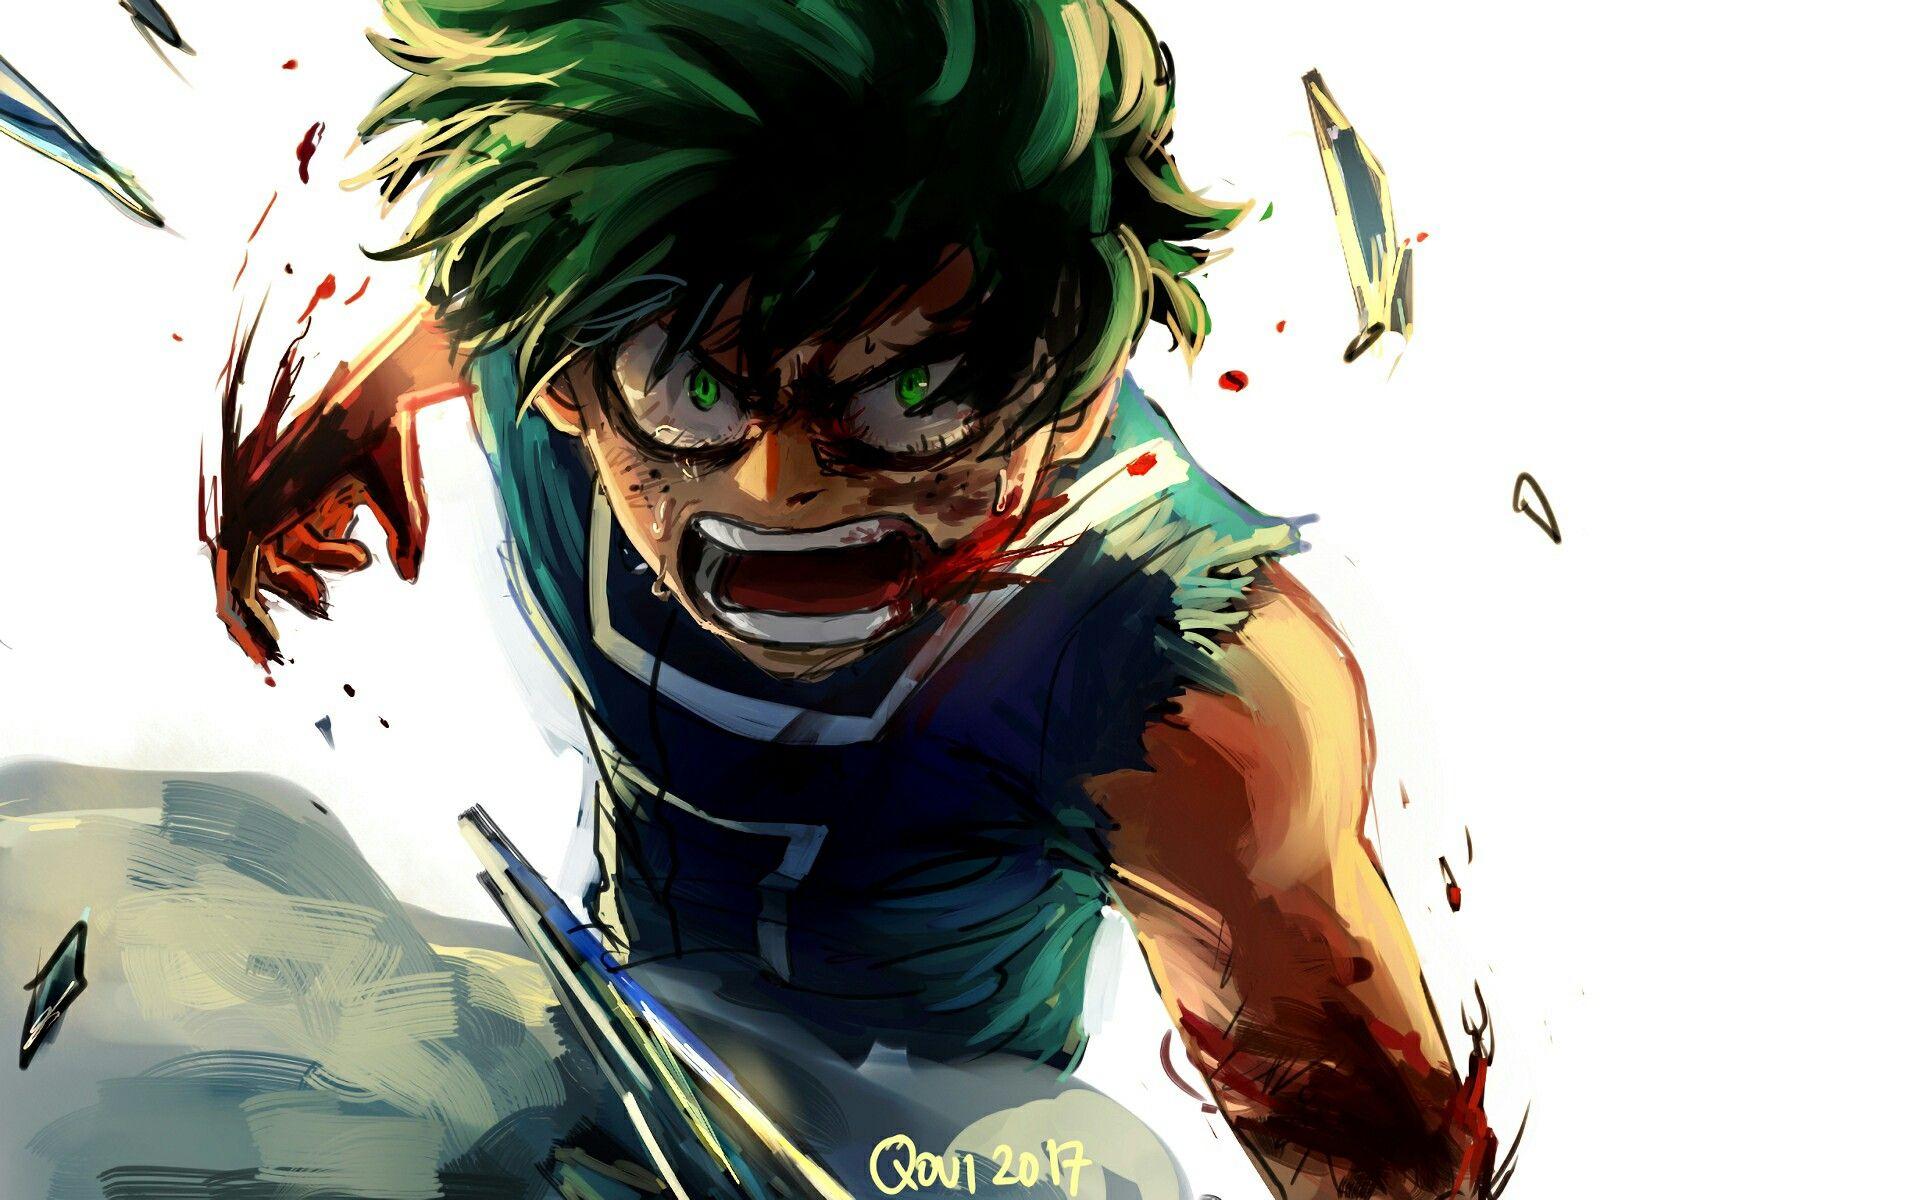 Boku no Hero (With images) Anime fight, My hero, Hero